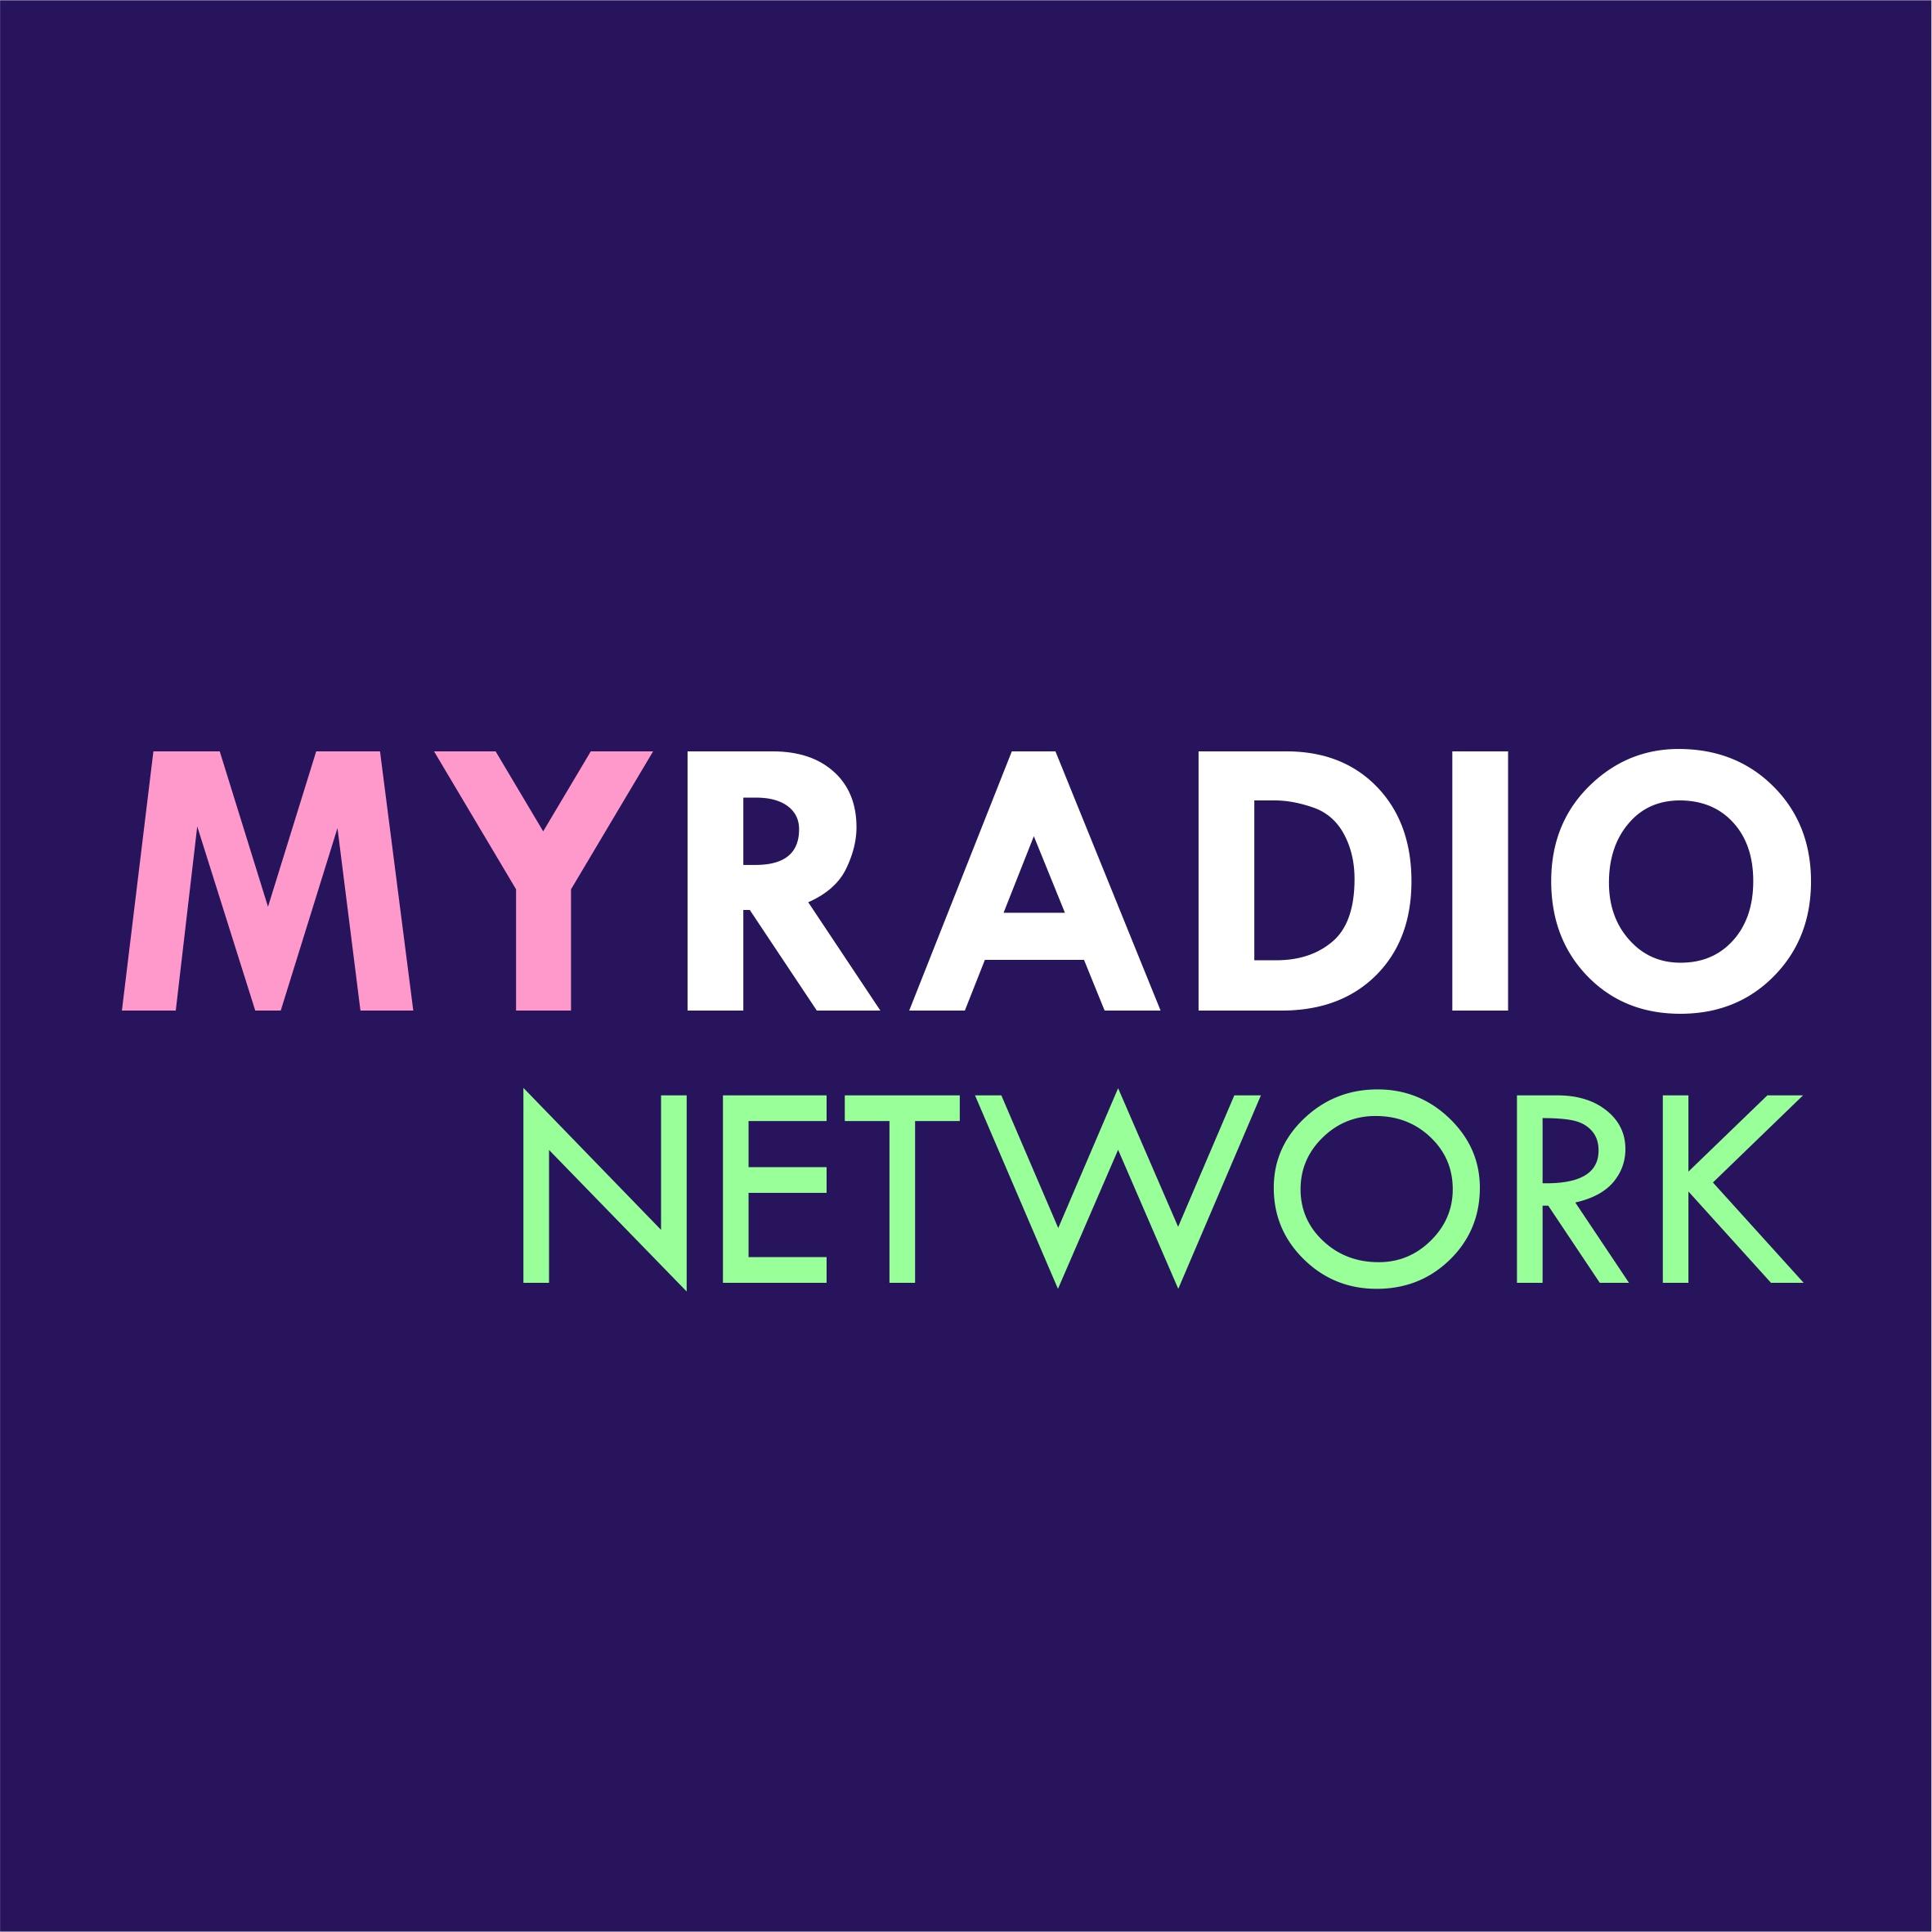 Art for advertising advert myradio network by myRadio Network